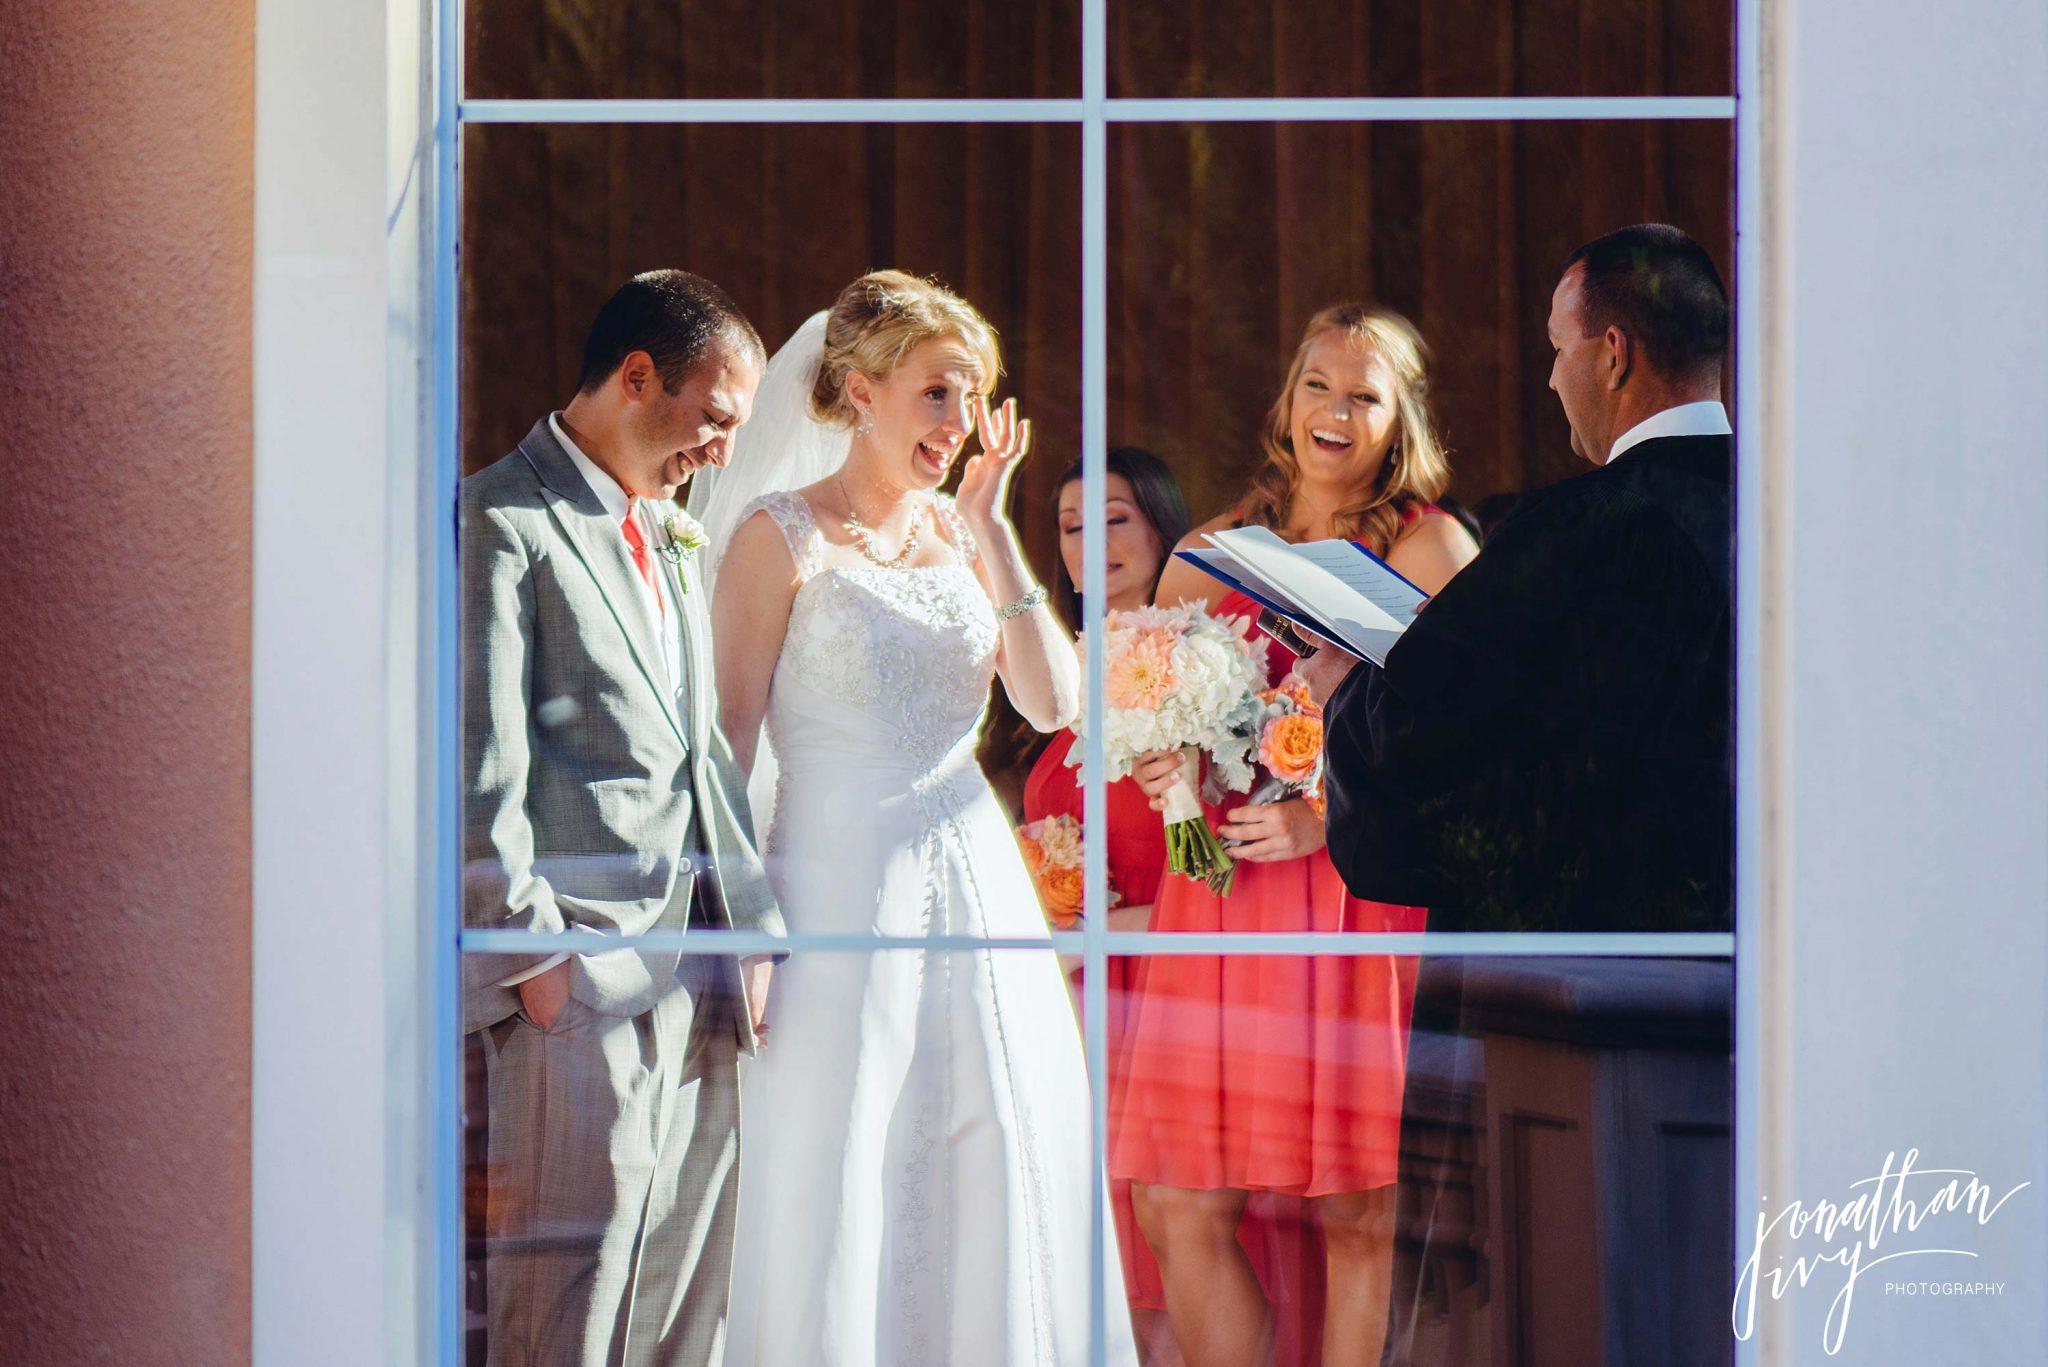 Chateau-polonez-wedding-houston_0020